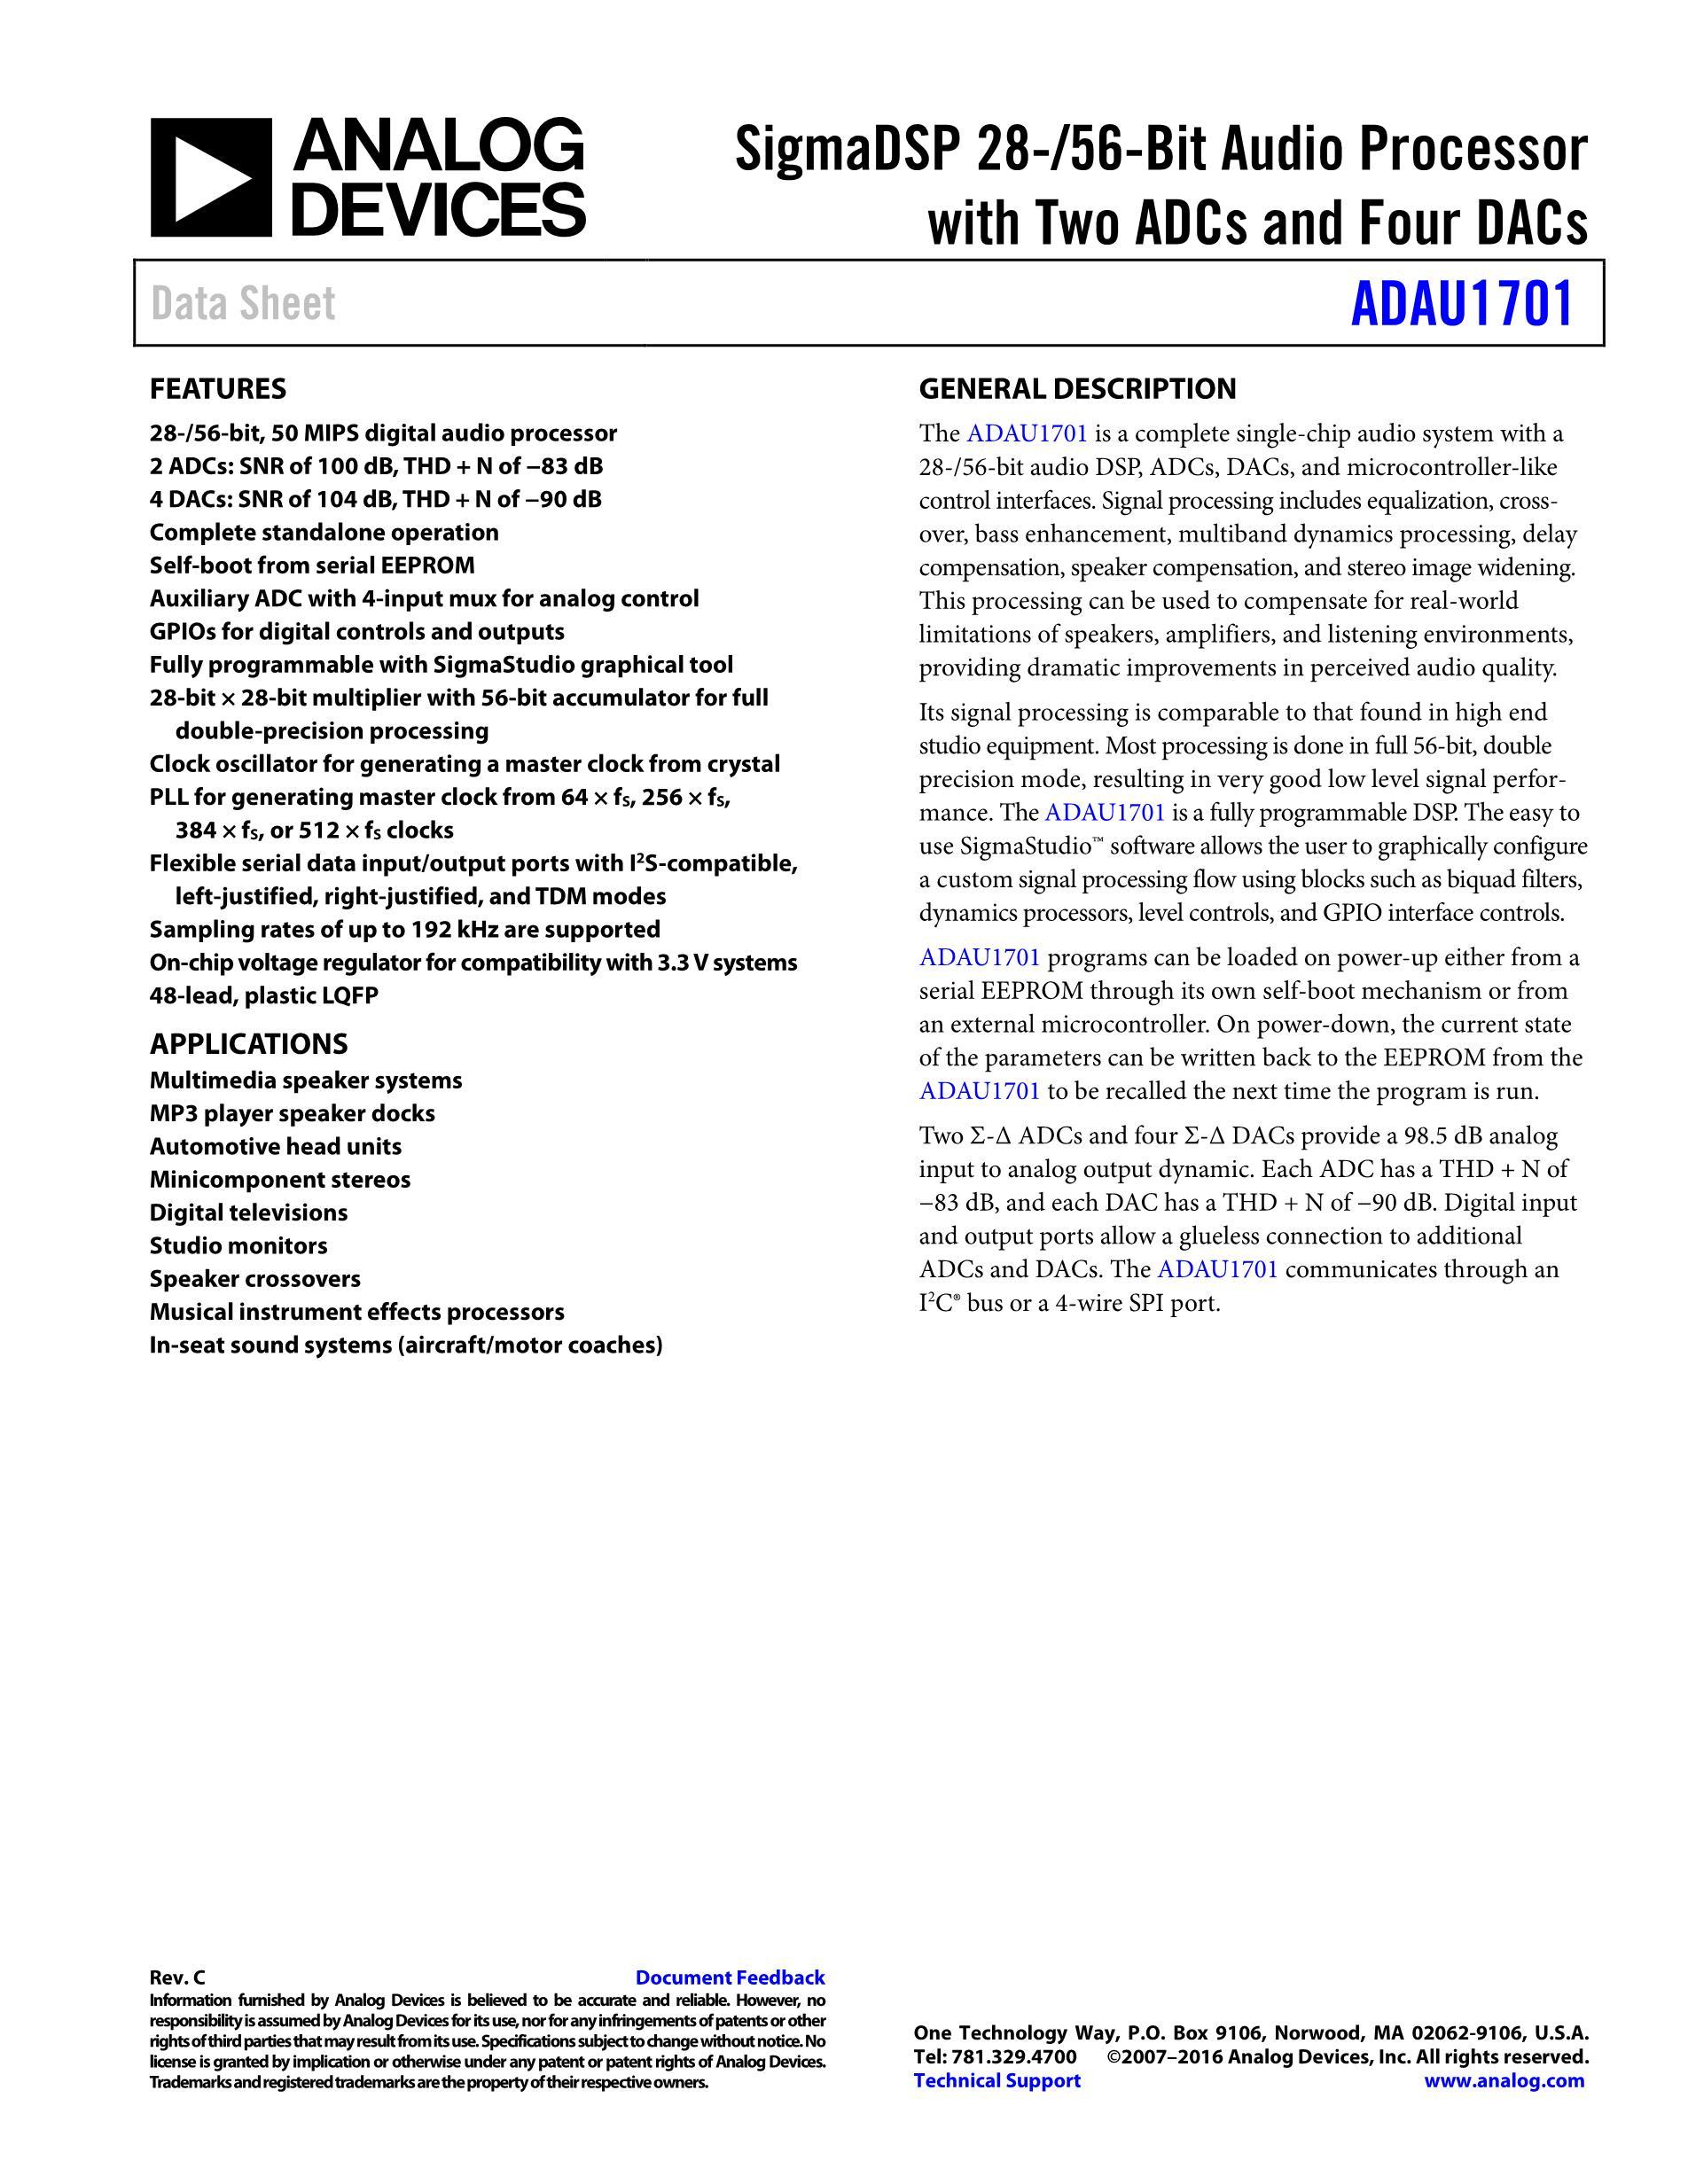 ADAU1787BCBZRL's pdf picture 1